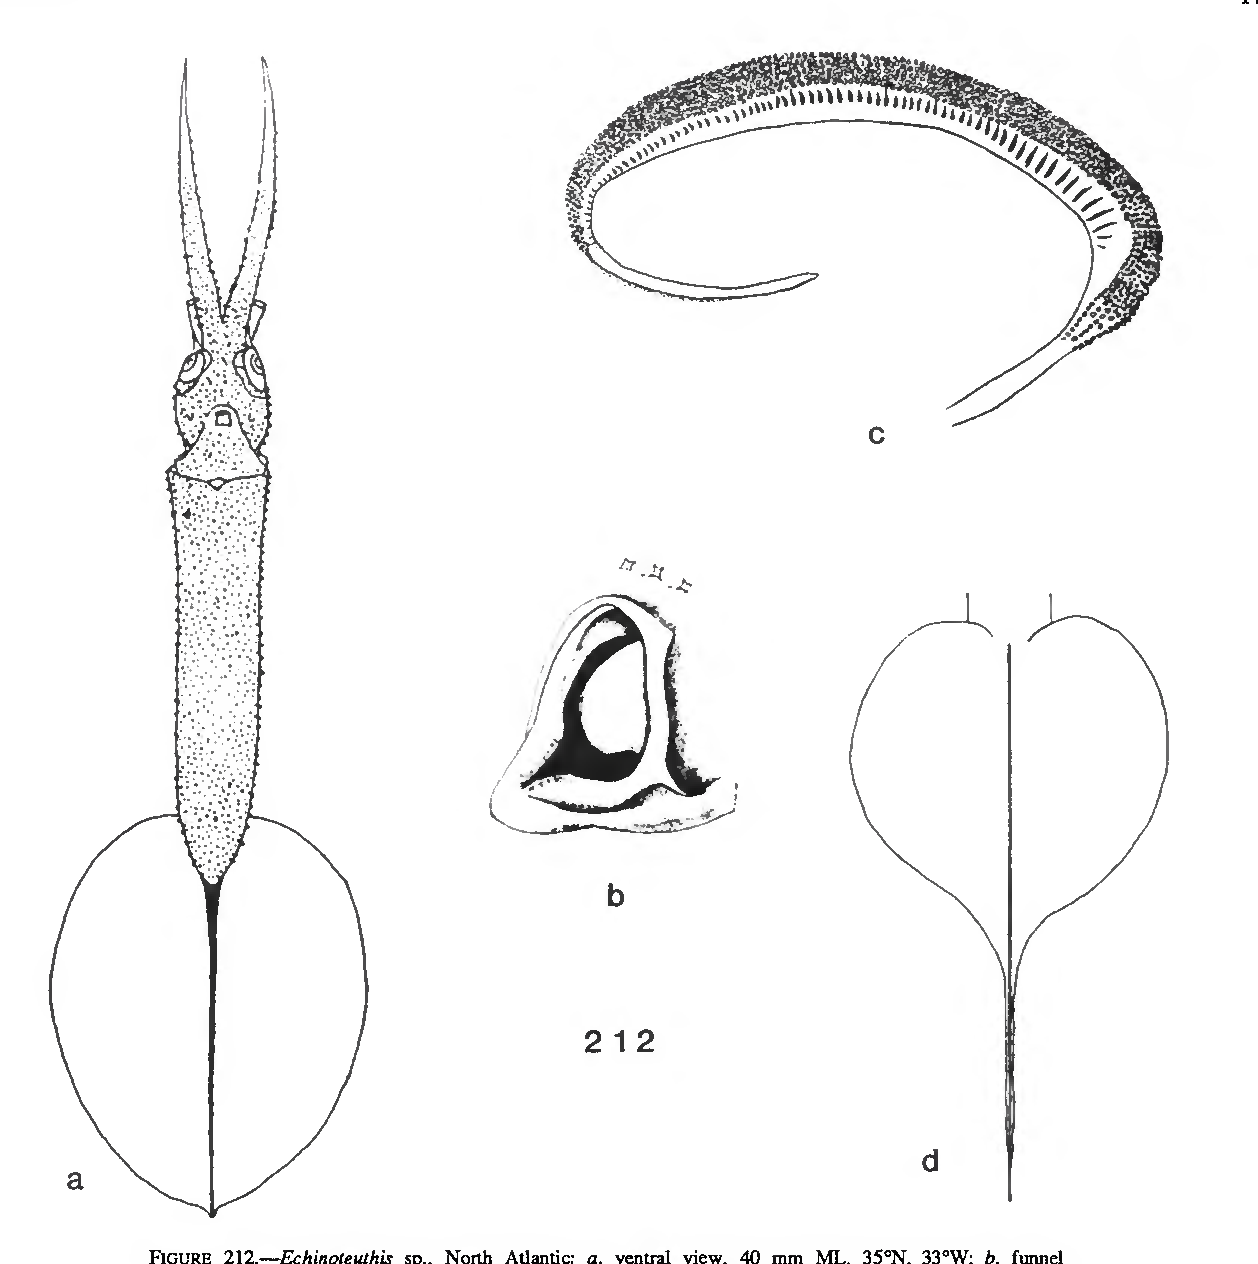 figure 212